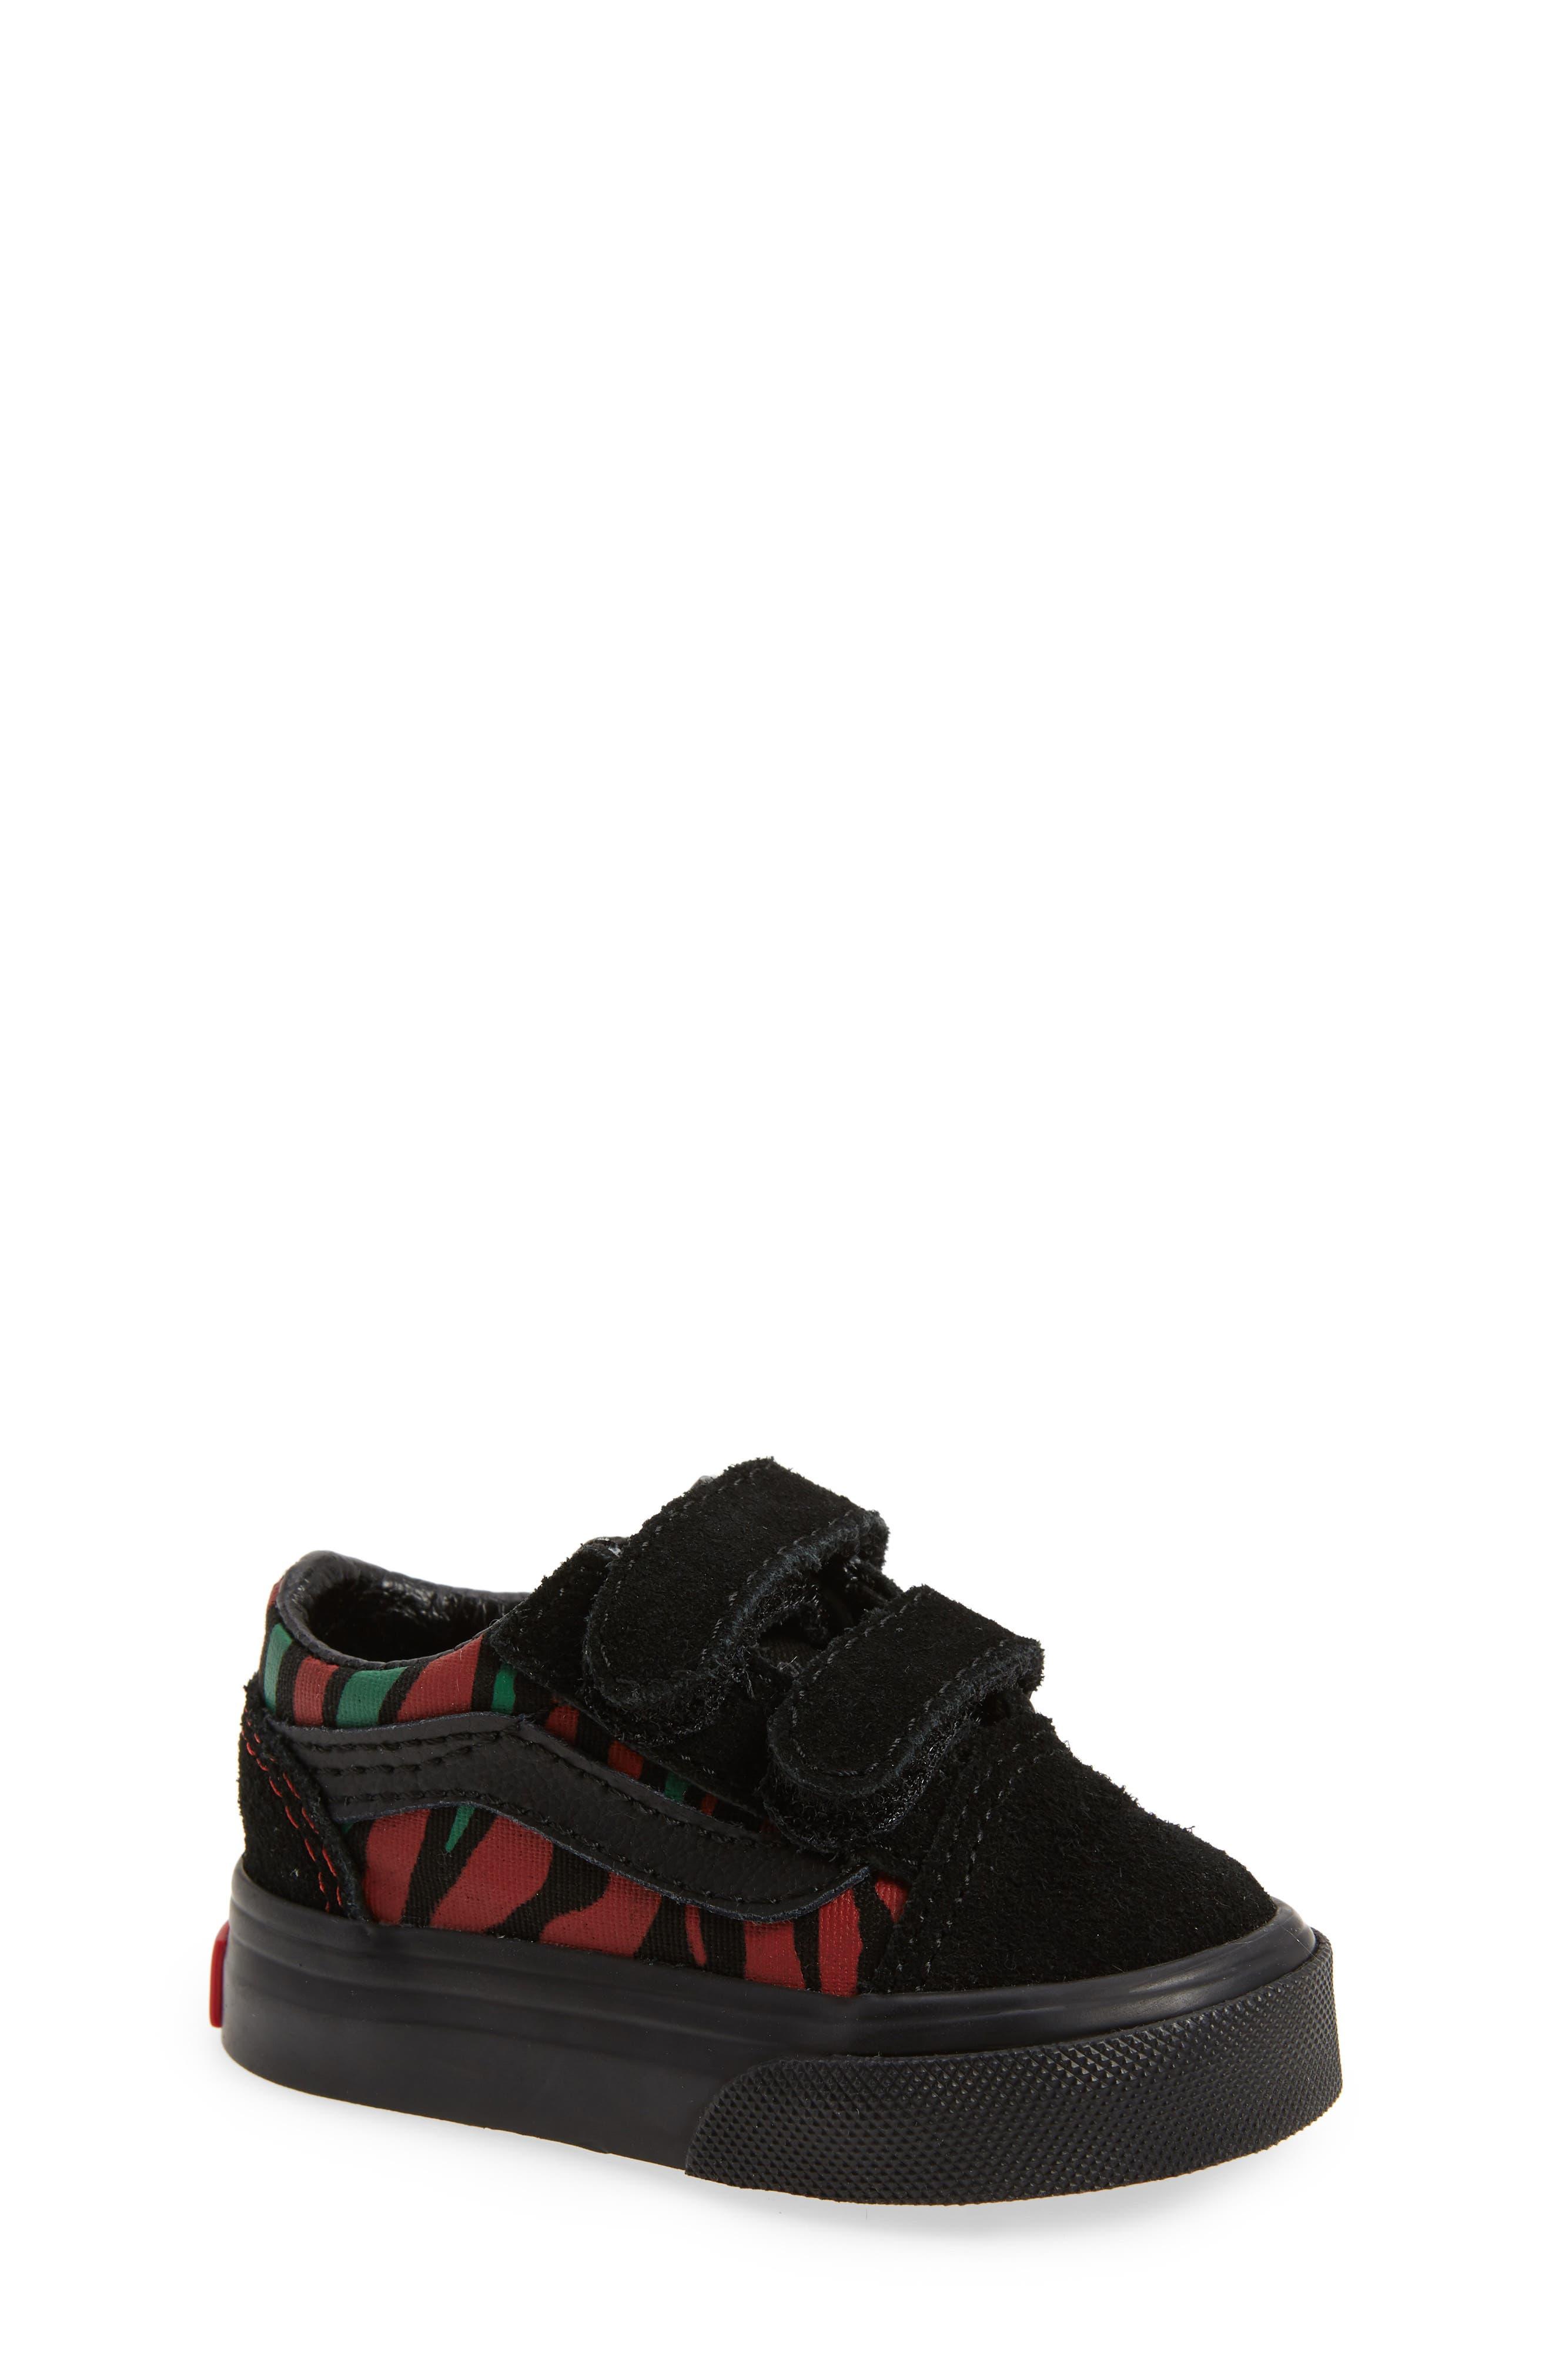 Old Skool V Sneaker,                             Main thumbnail 1, color,                             Black